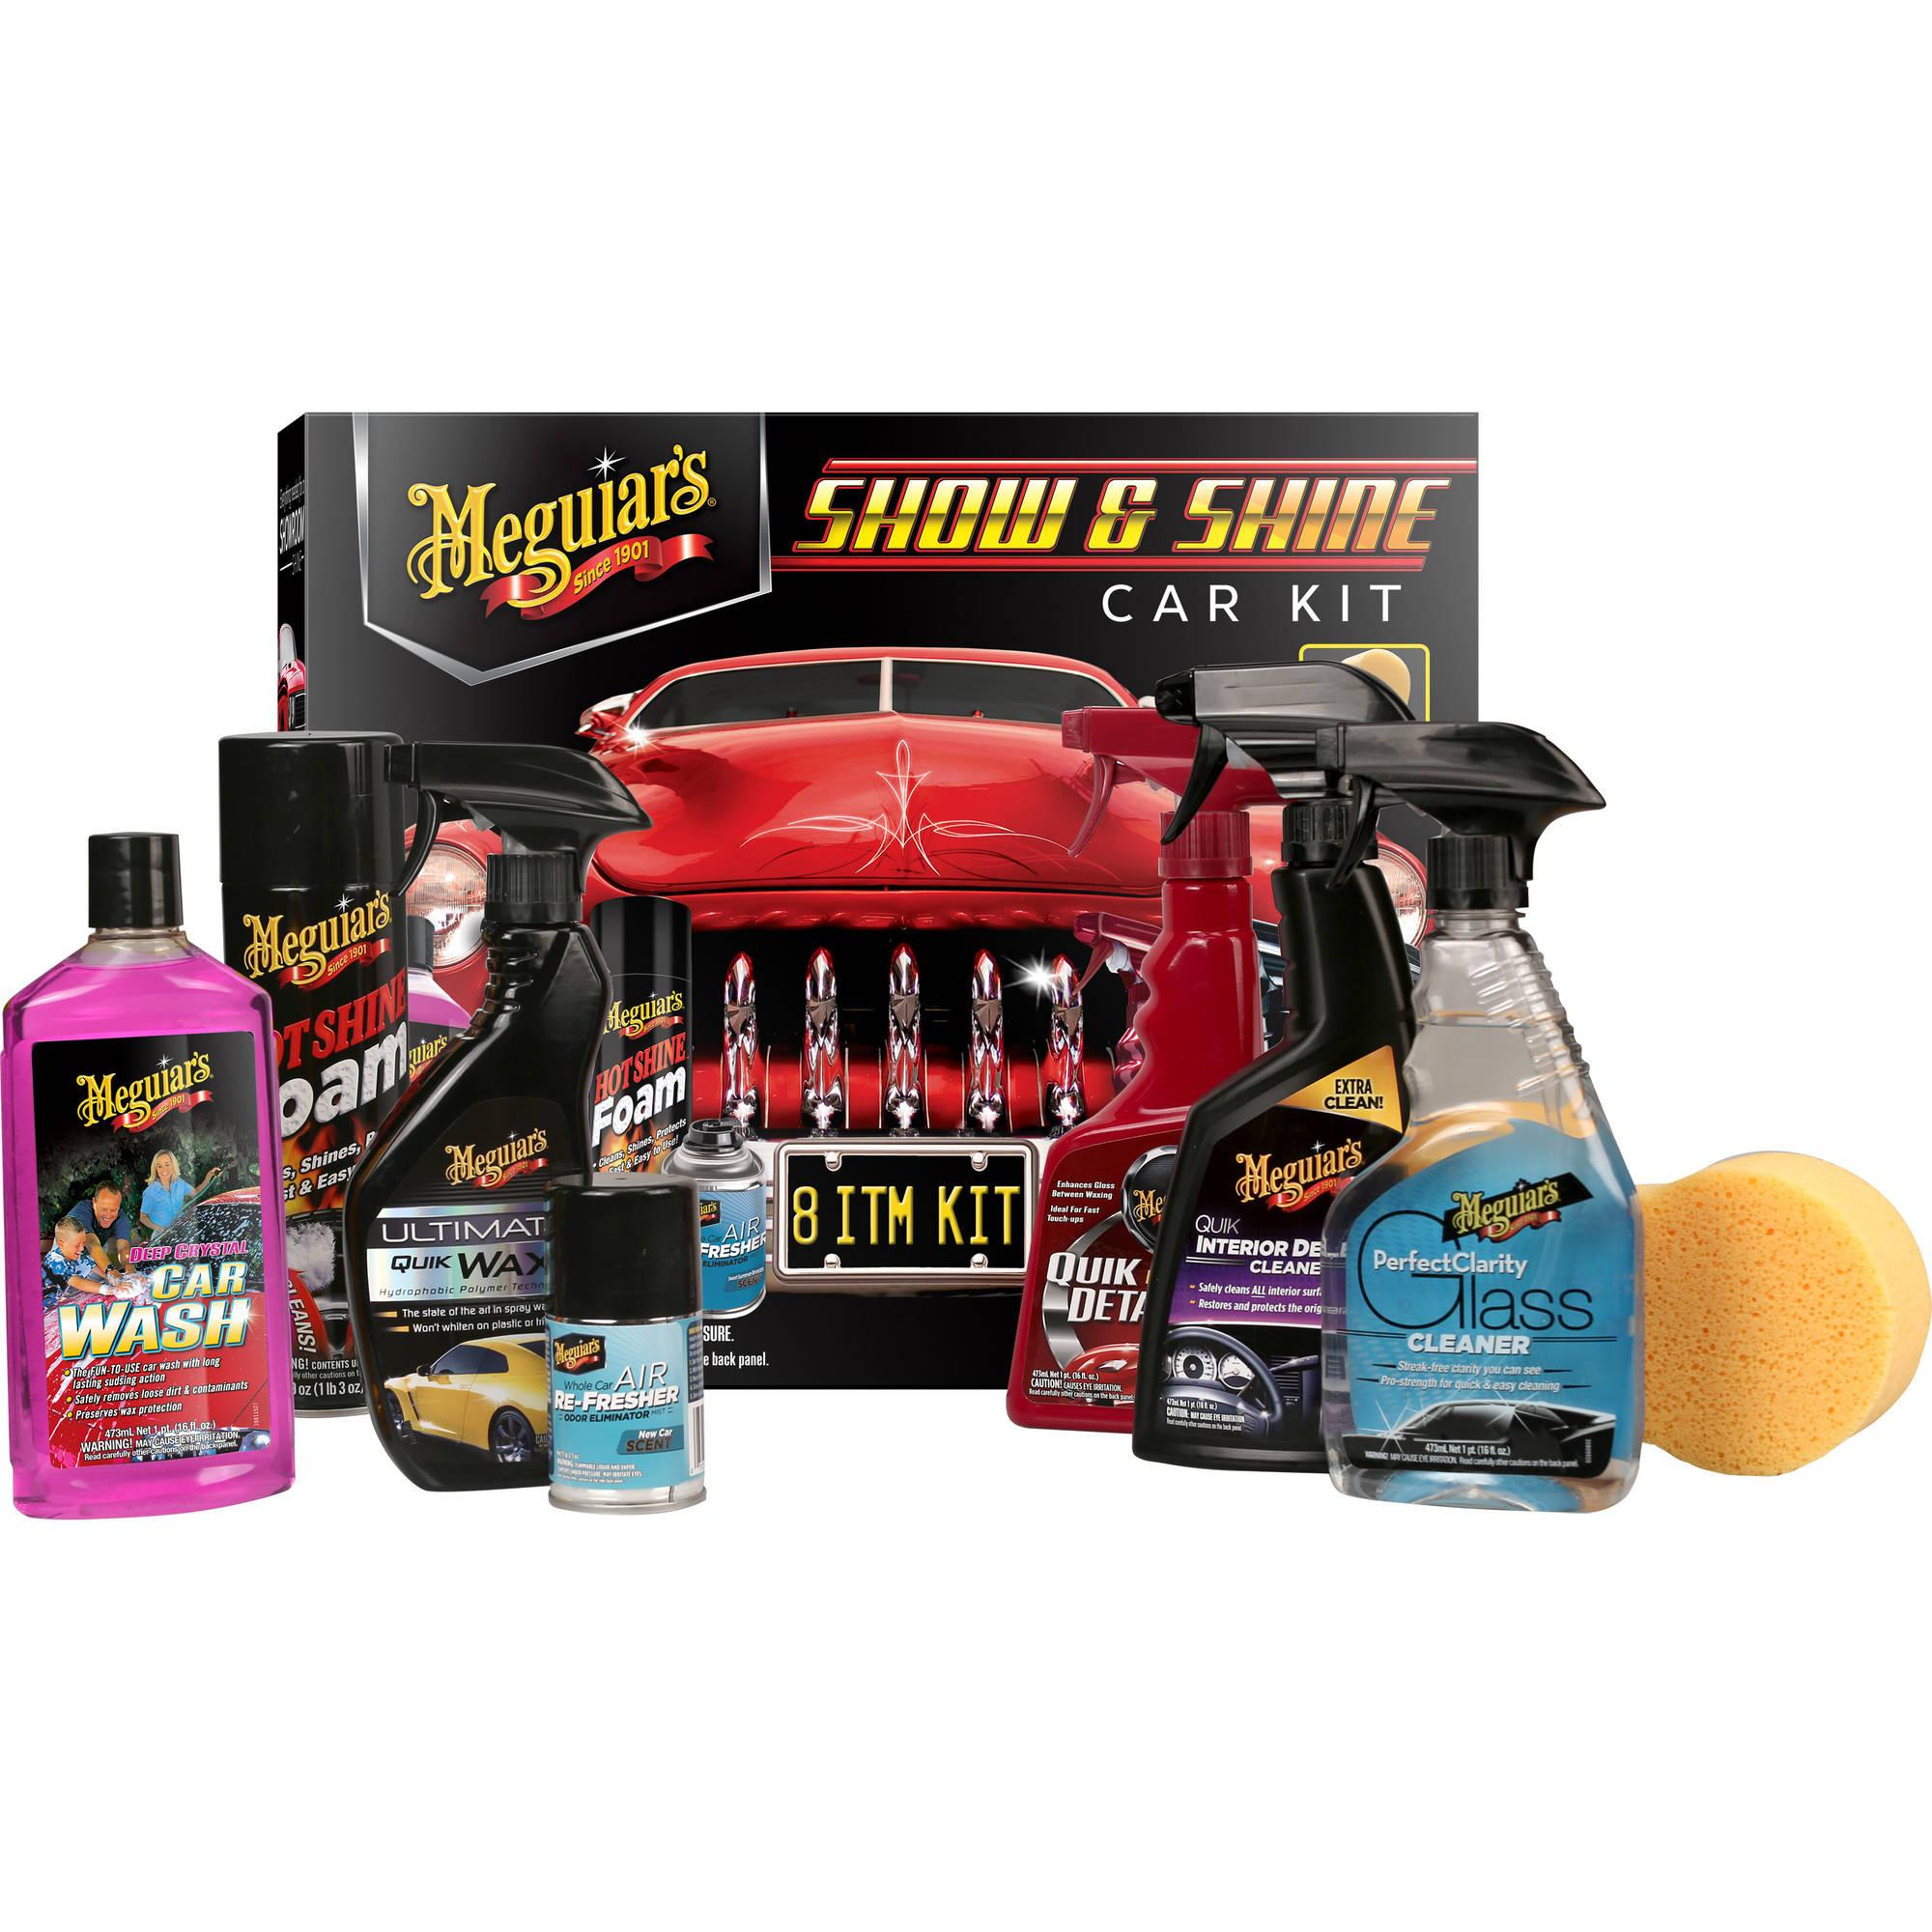 Meguiar's Car Care Gift Kit - Show and Shine